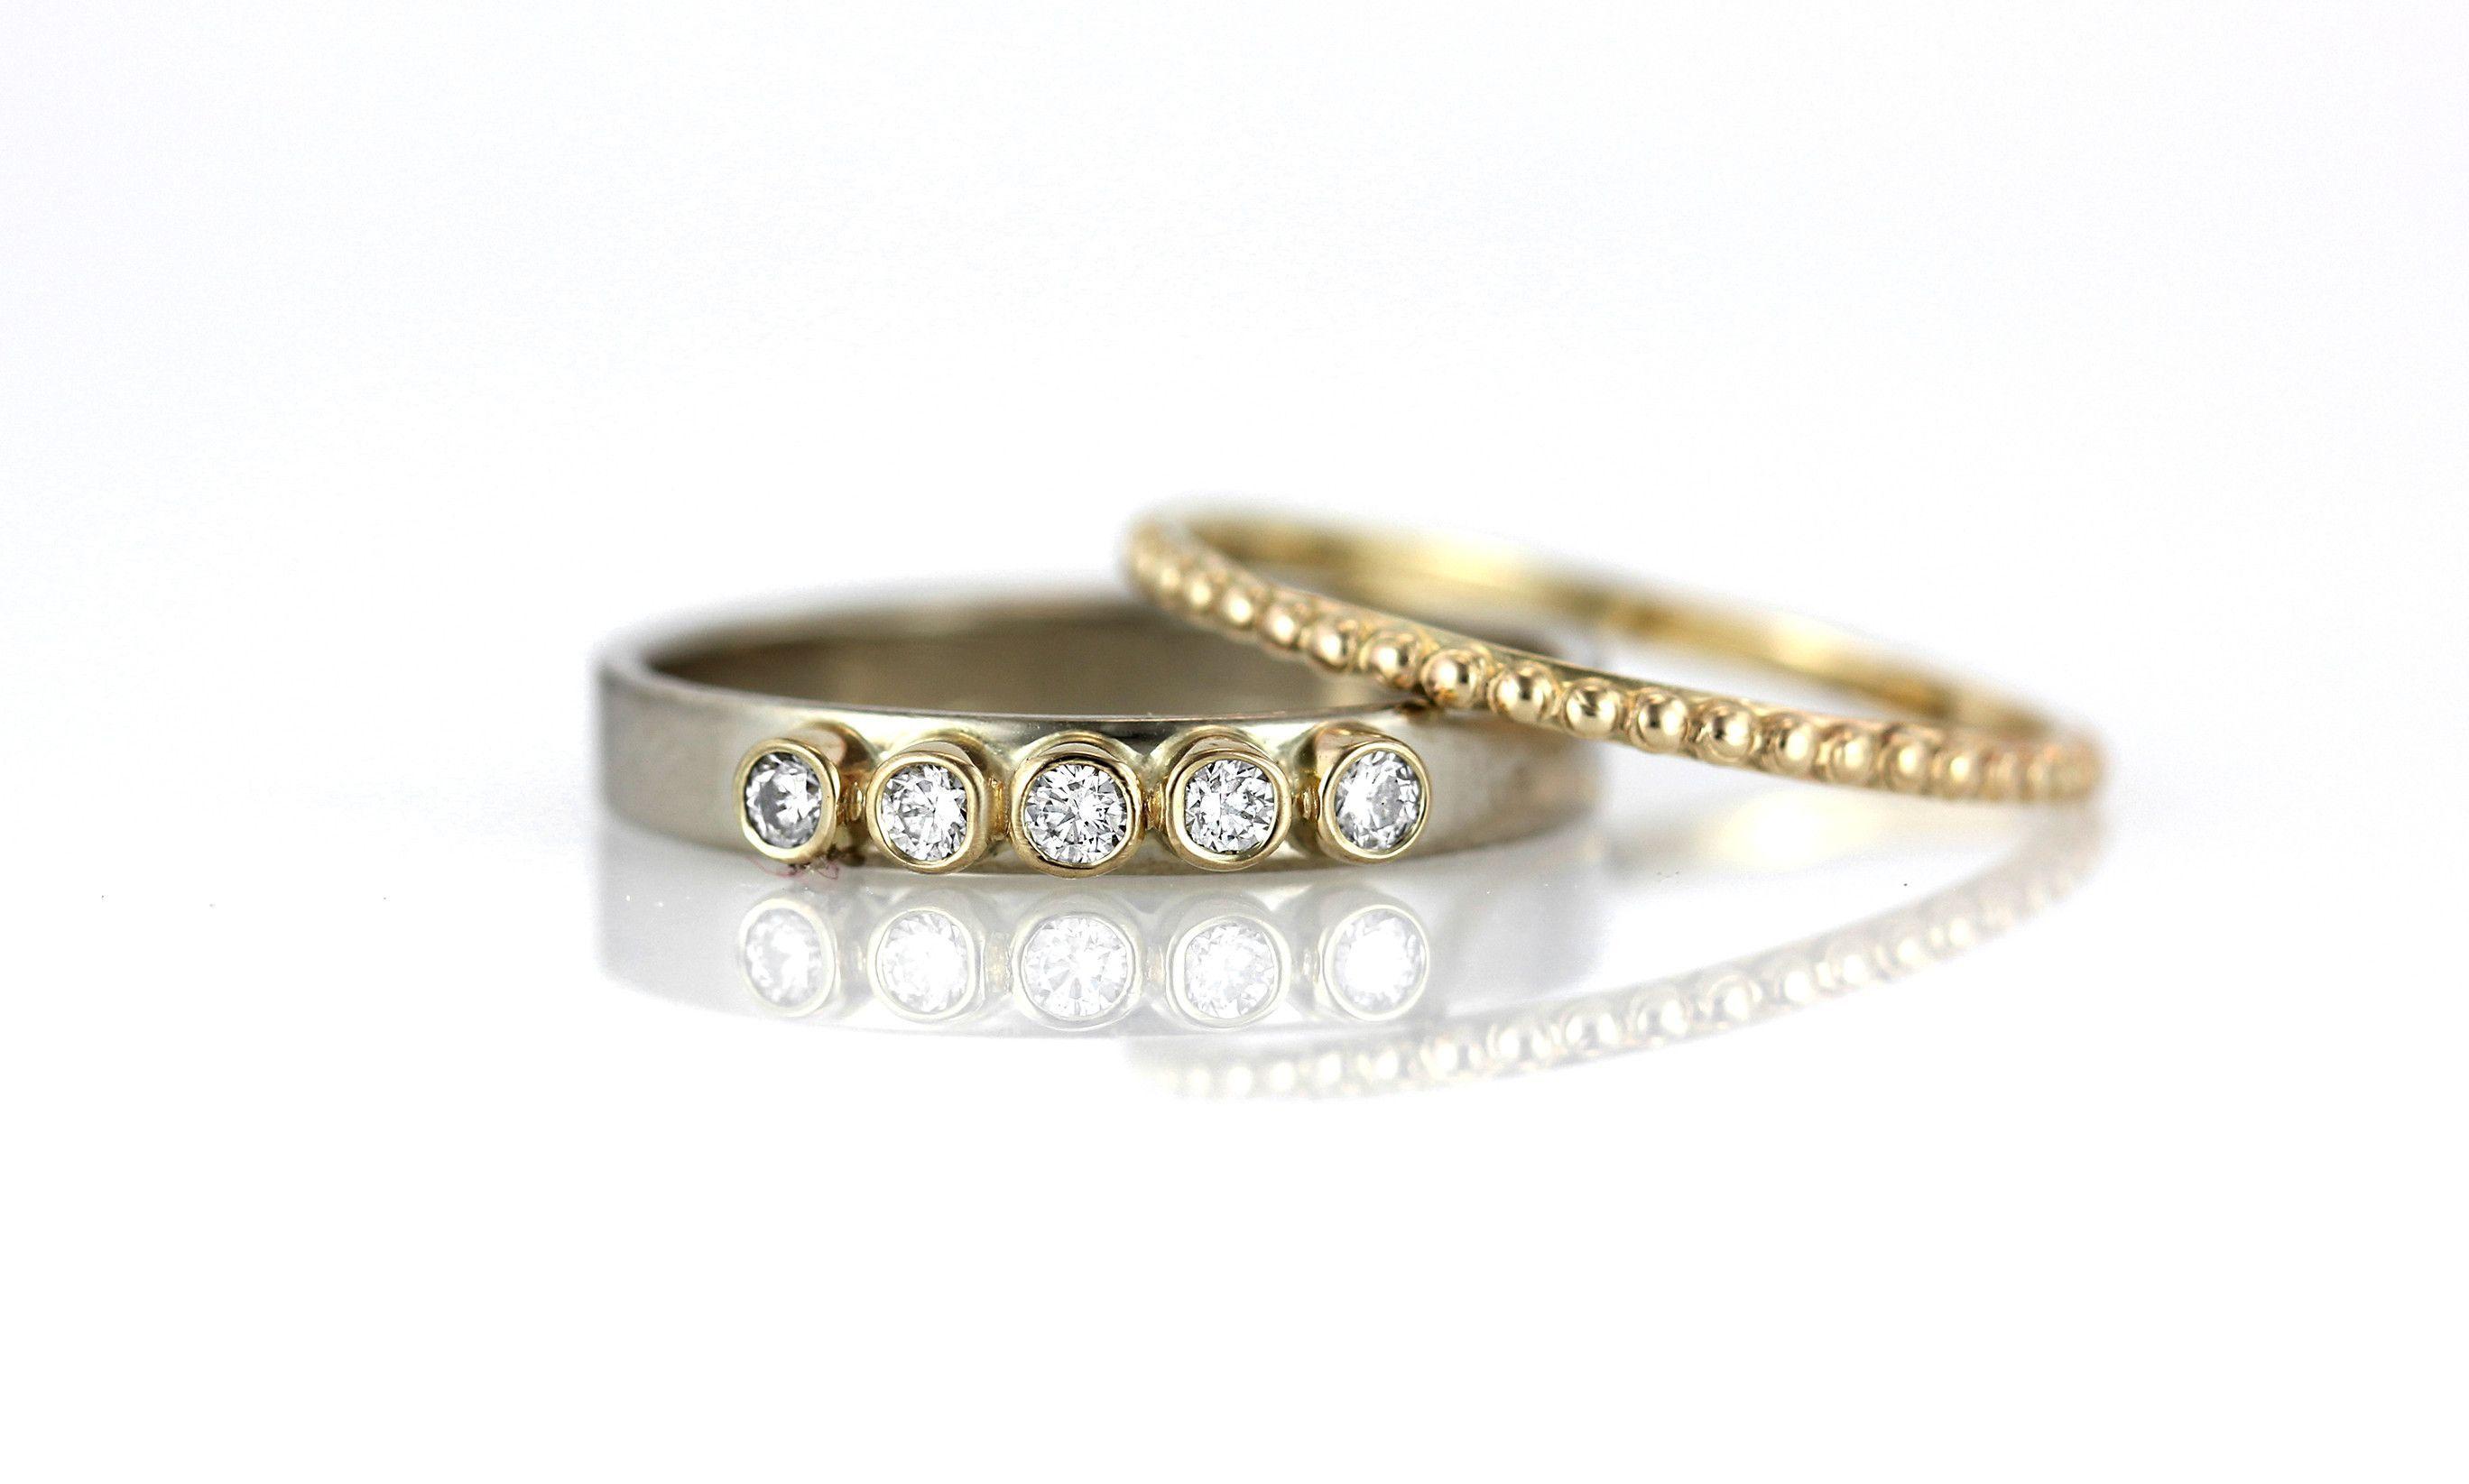 Two Tone Conflict Free Five Diamond Engagement Ring Pee Milgrain Wedding Band Set